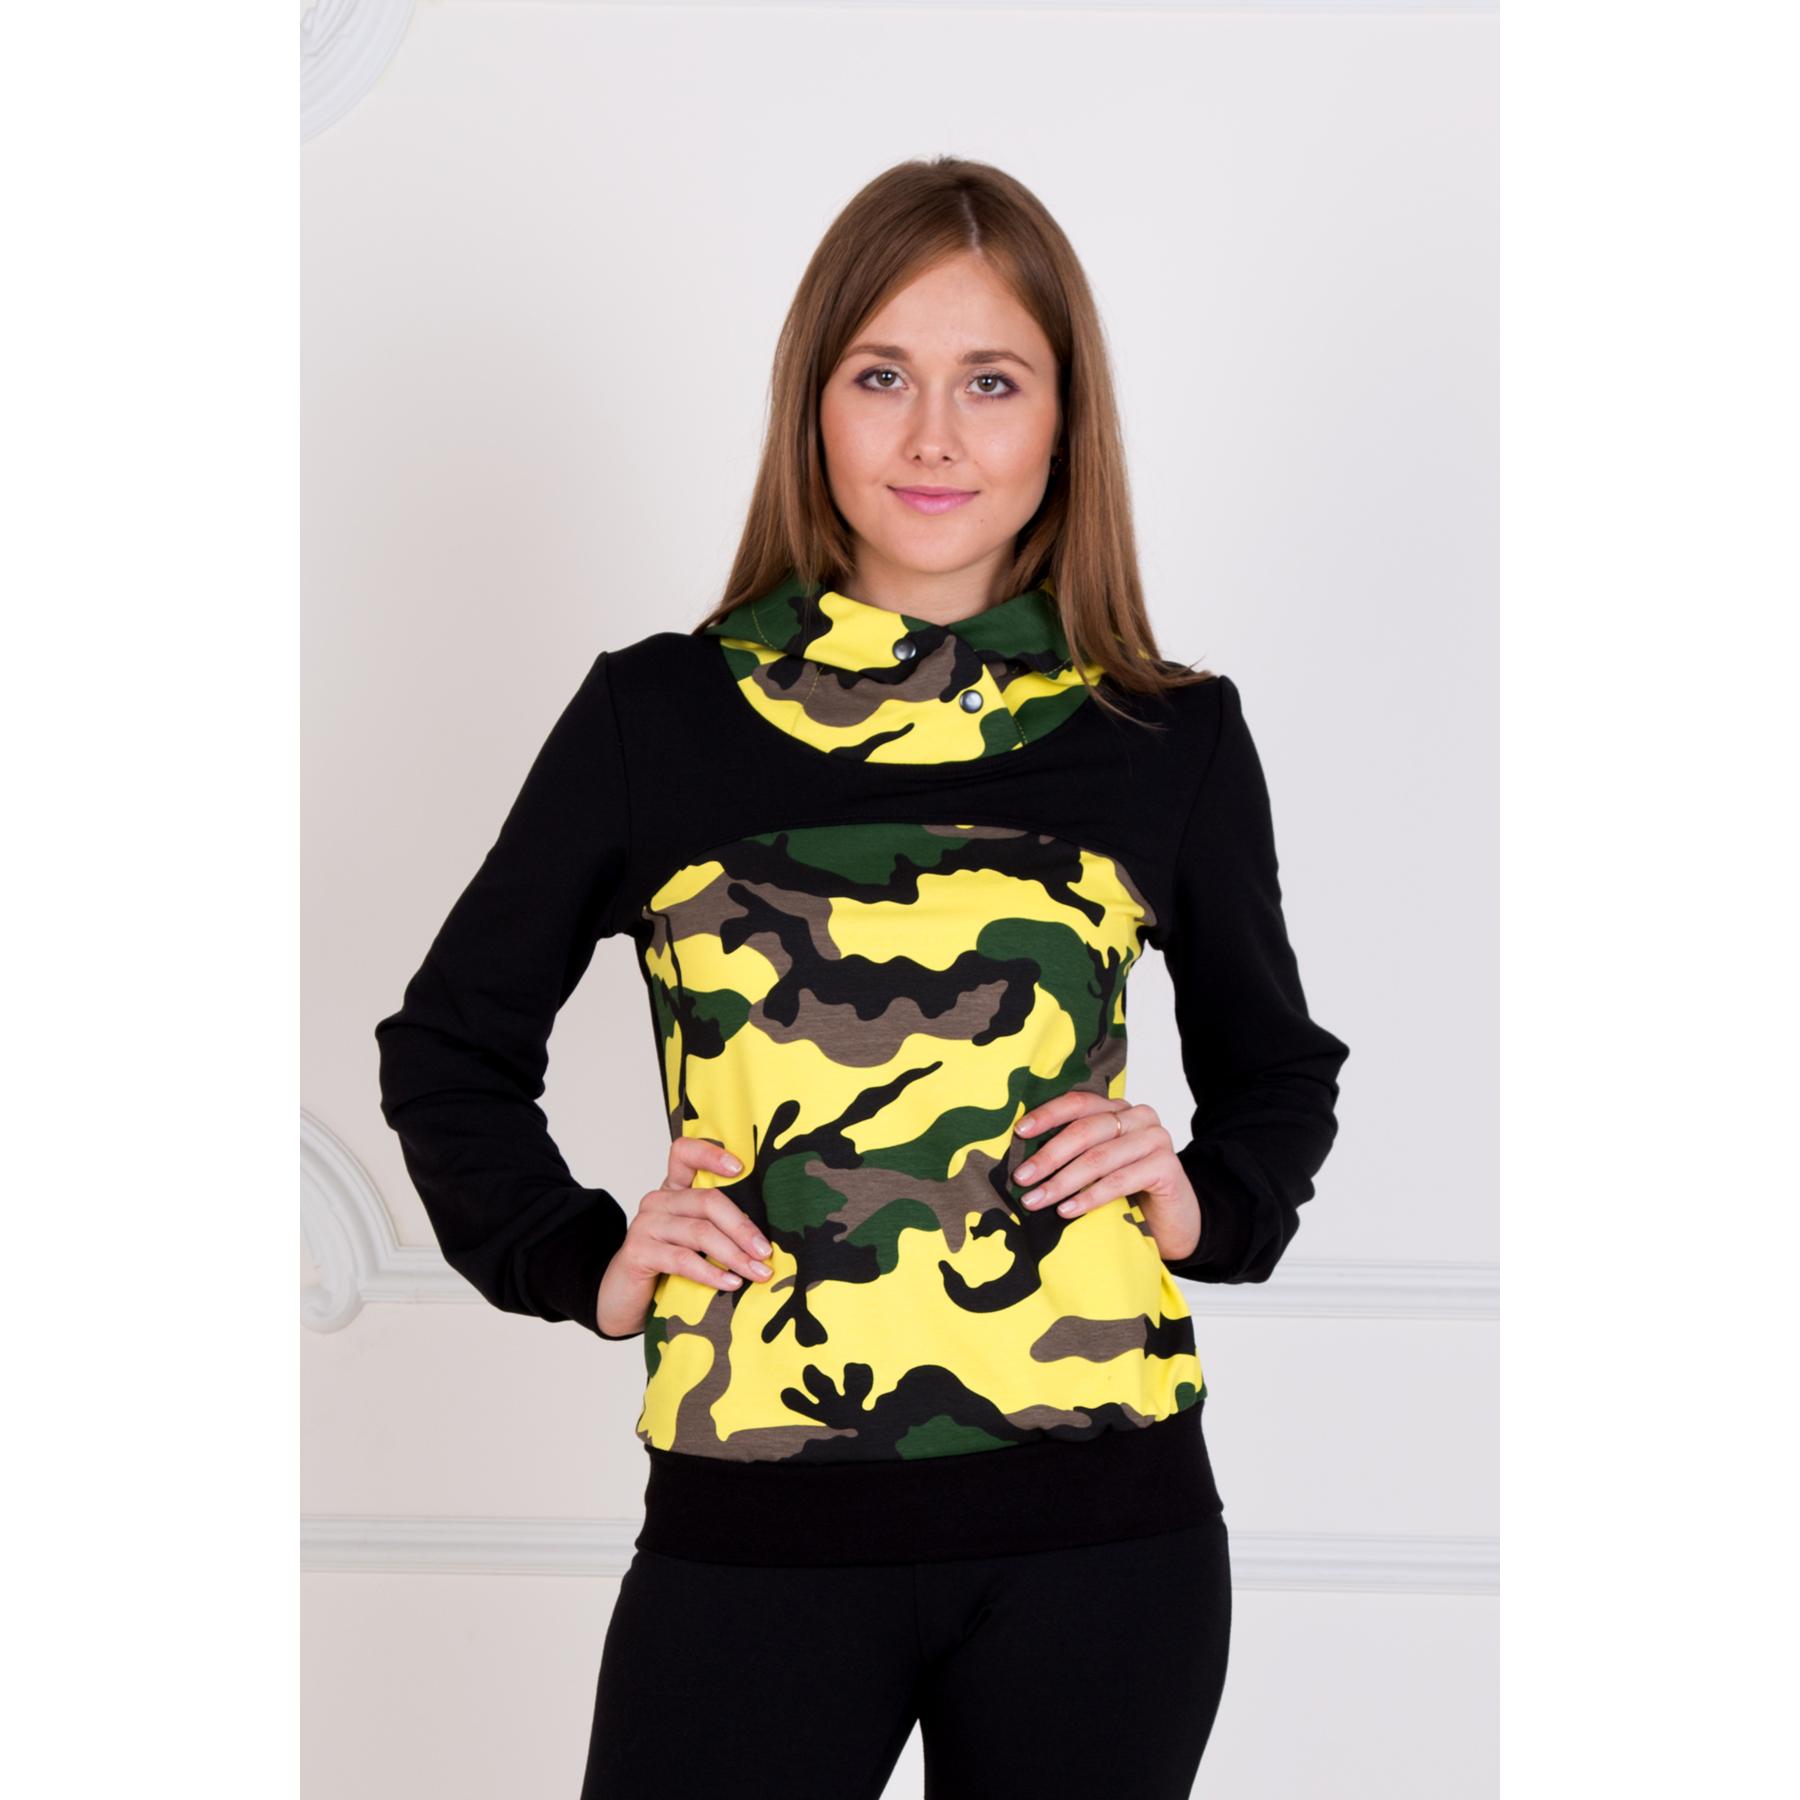 Женский костюм «Виват», размер 44 Лика Дресс